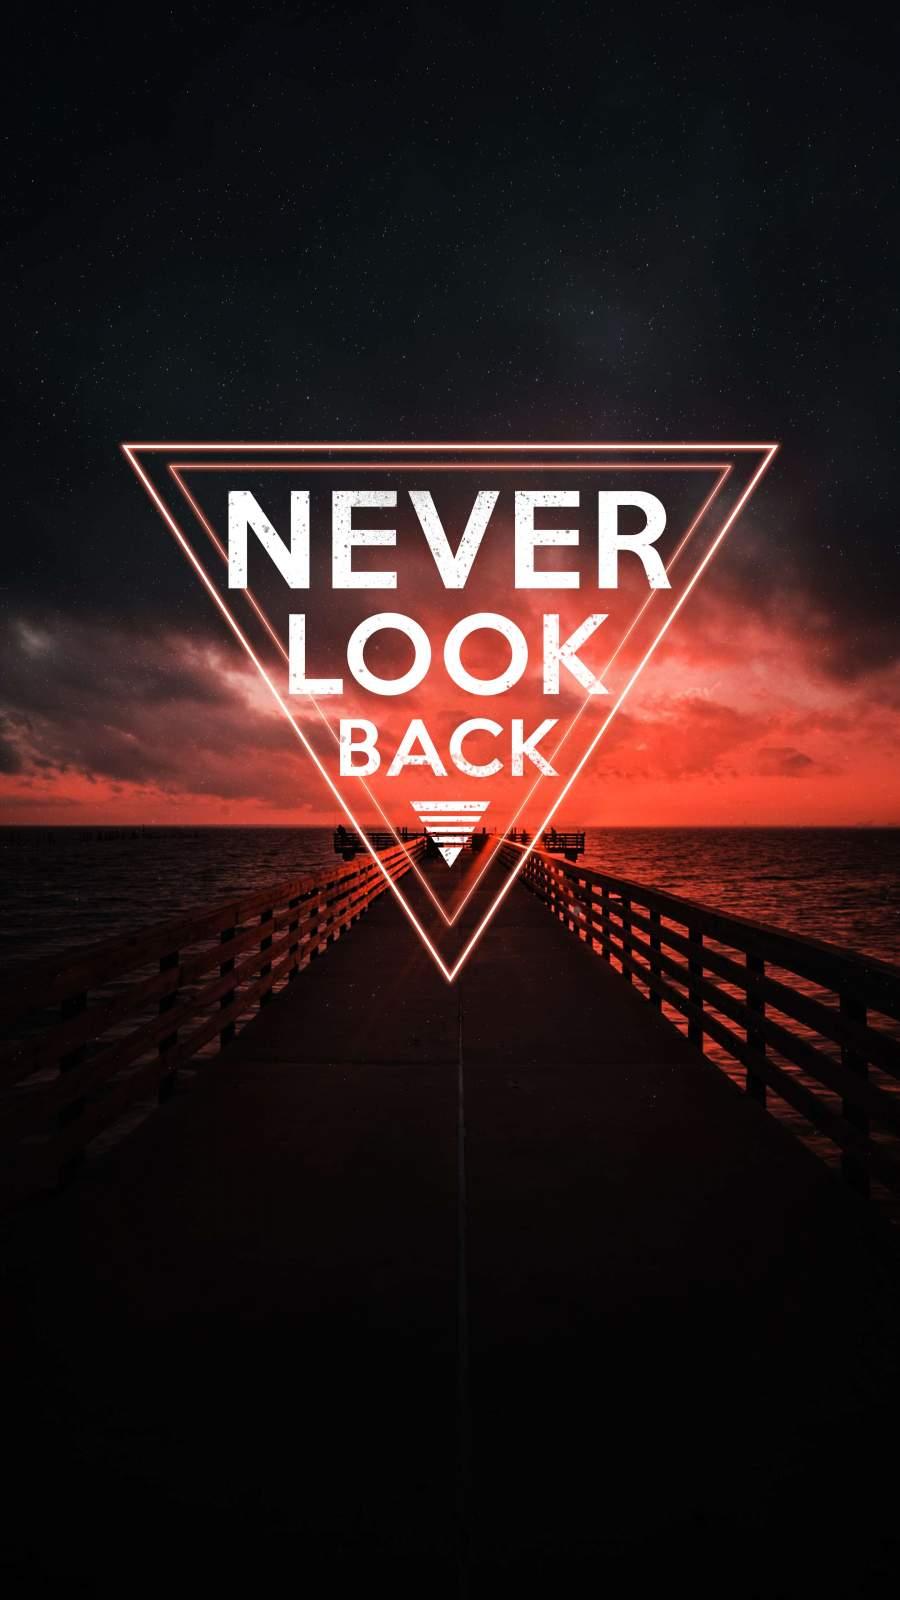 Never Look Back iPhone Wallpaper